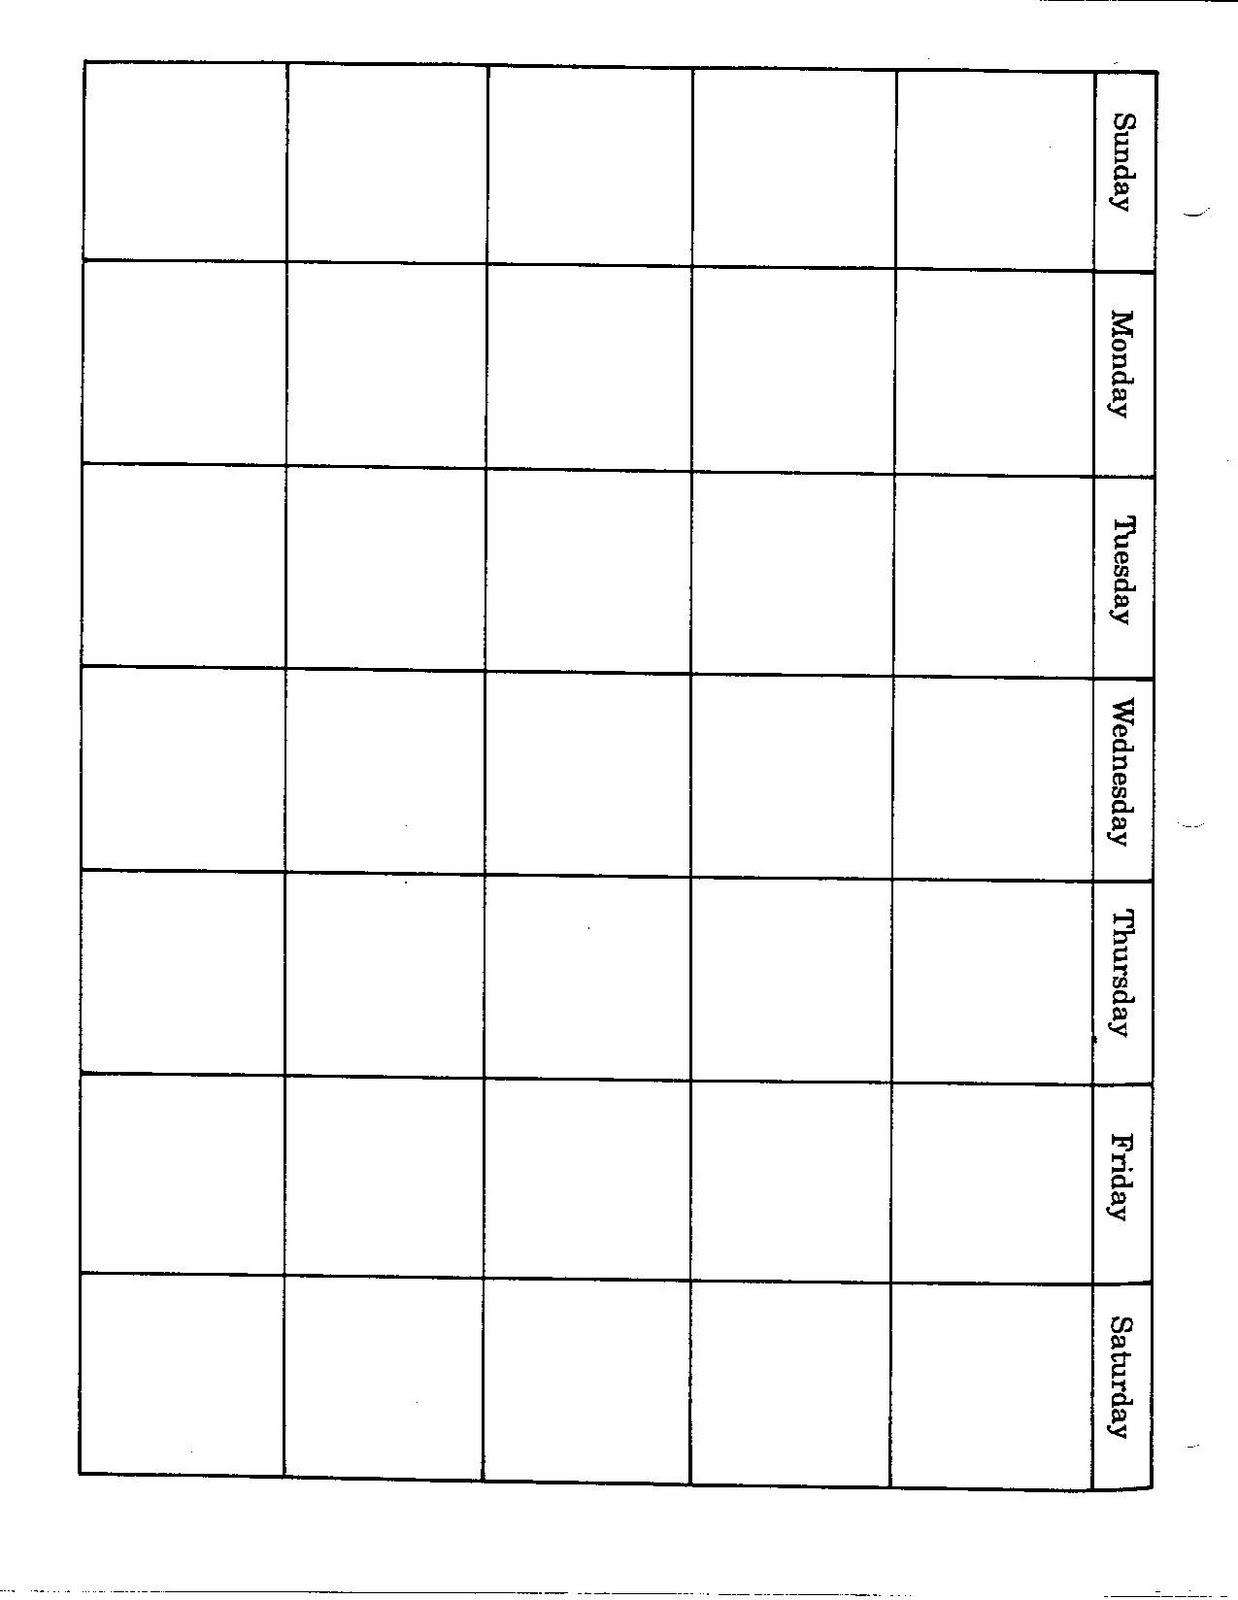 July Calendar Template Zrom Tk Blank Monthly Mychjp Generic Weekly regarding Fill In Monthly Calendar Template